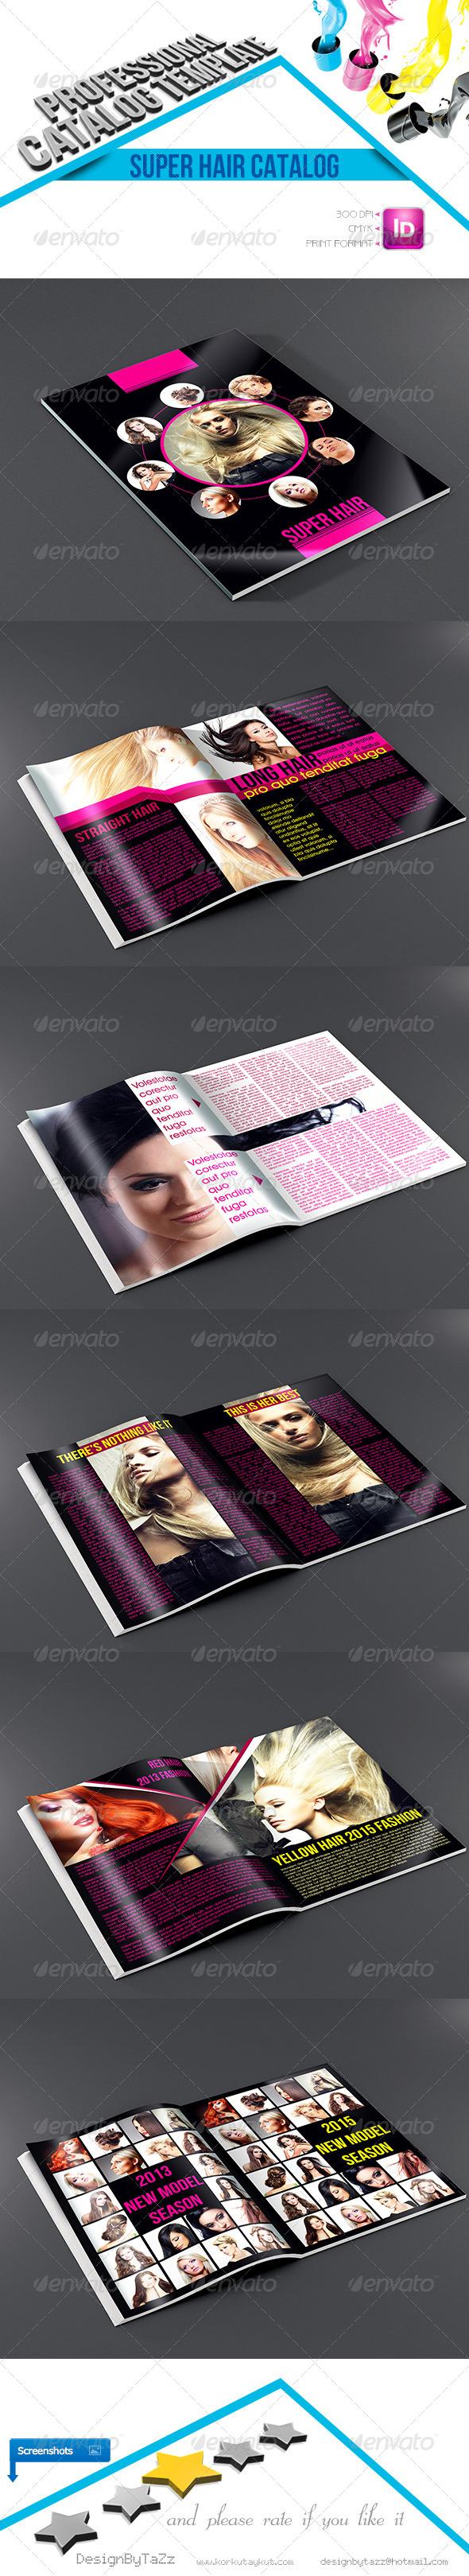 Super Hair Catalog Template - Brochures Print Templates